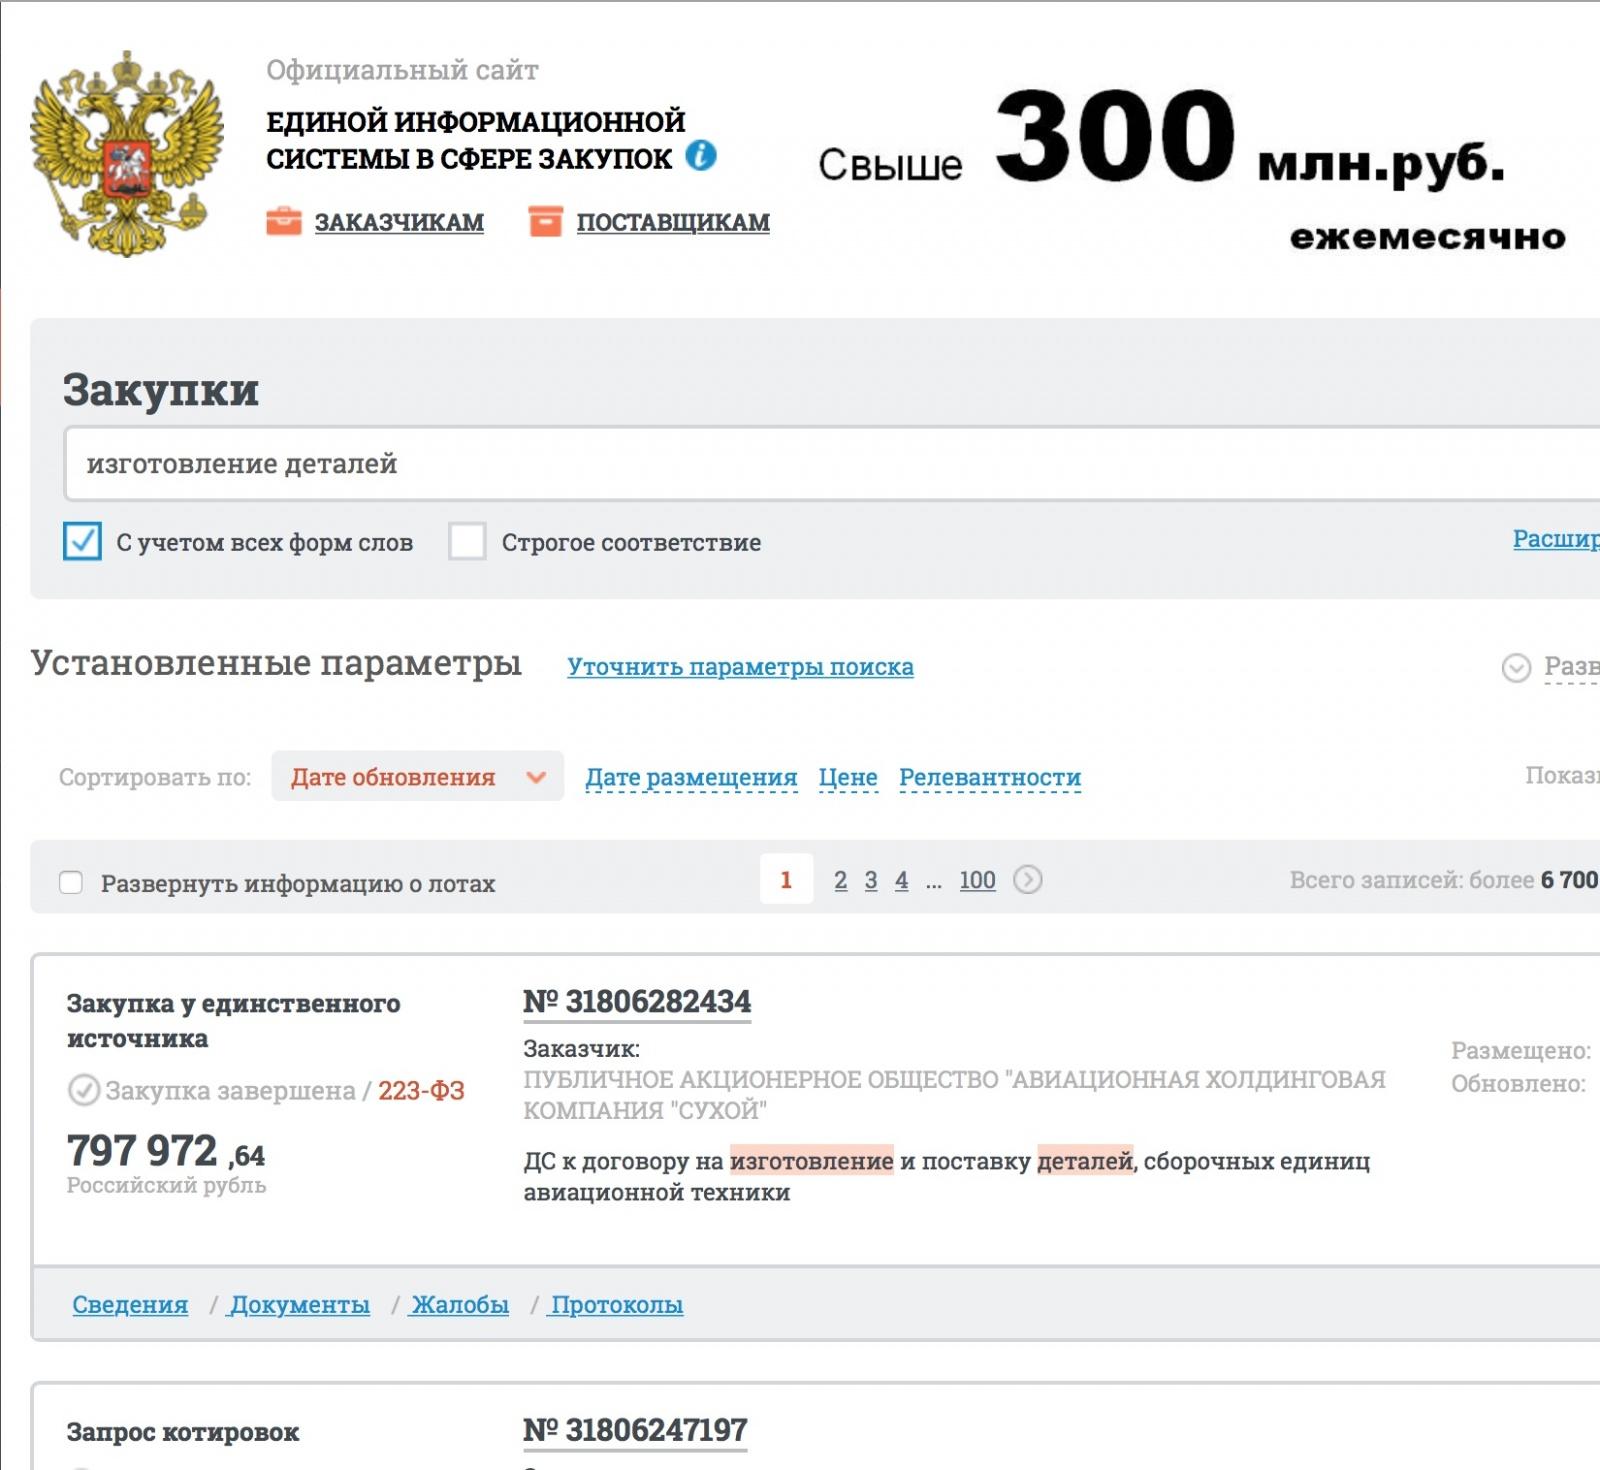 300 млрд. руб. ежегодно